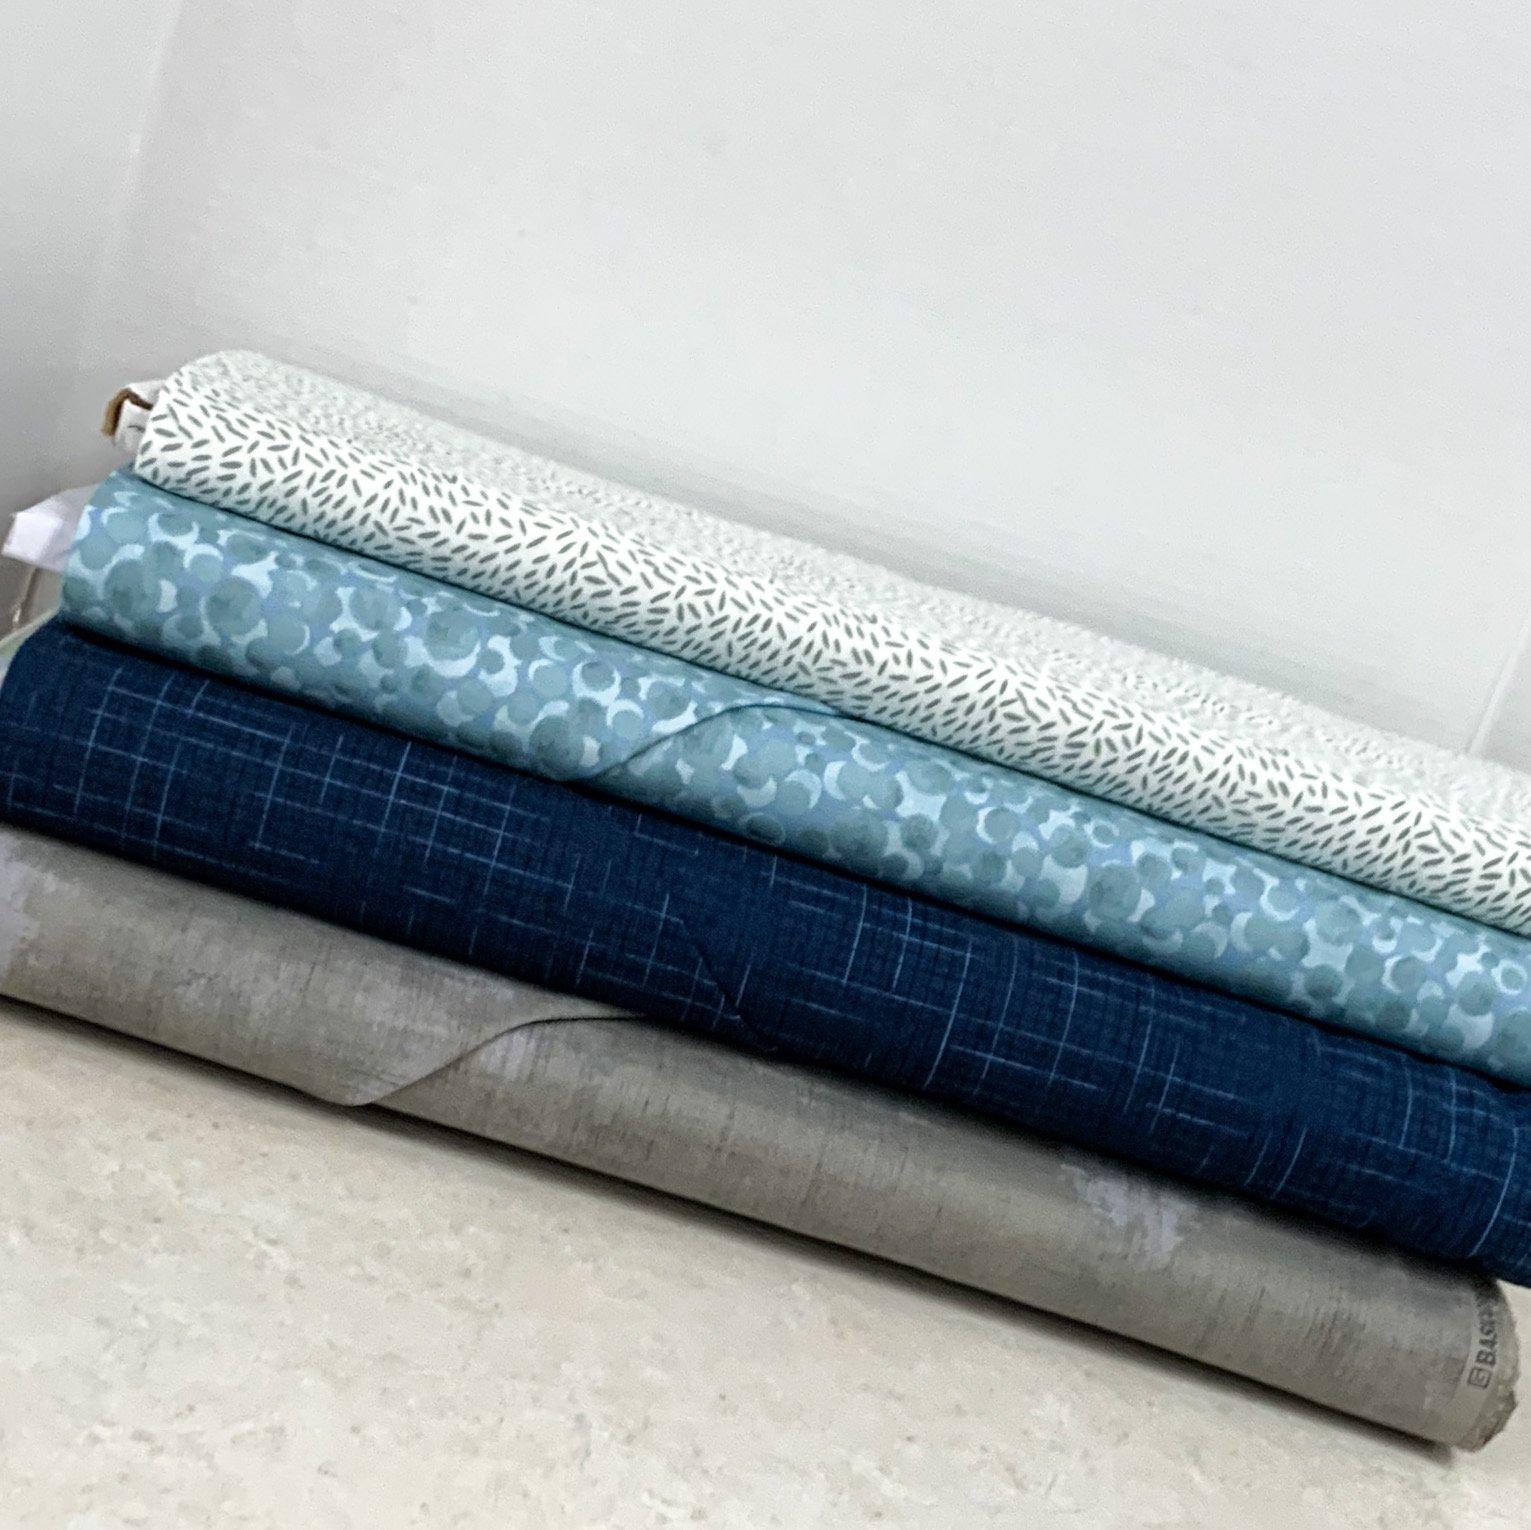 Creekside April Showers Fabric Bundle 1 Yard Cuts